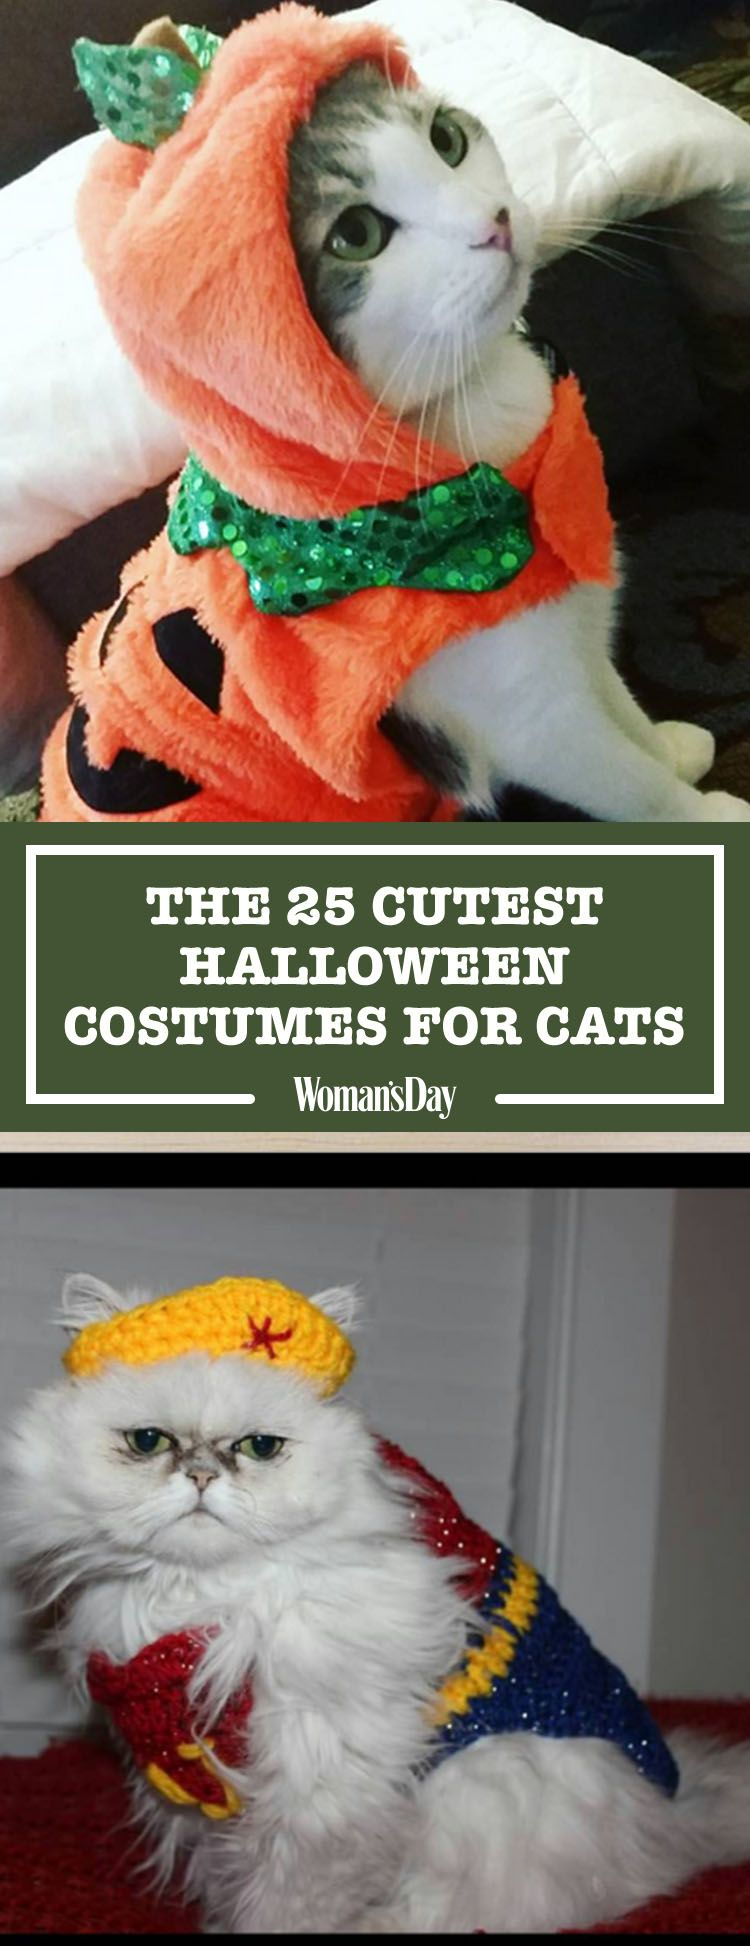 30 Pet Cat Halloween Costumes 2017 - Cute Ideas for Cat Costumes